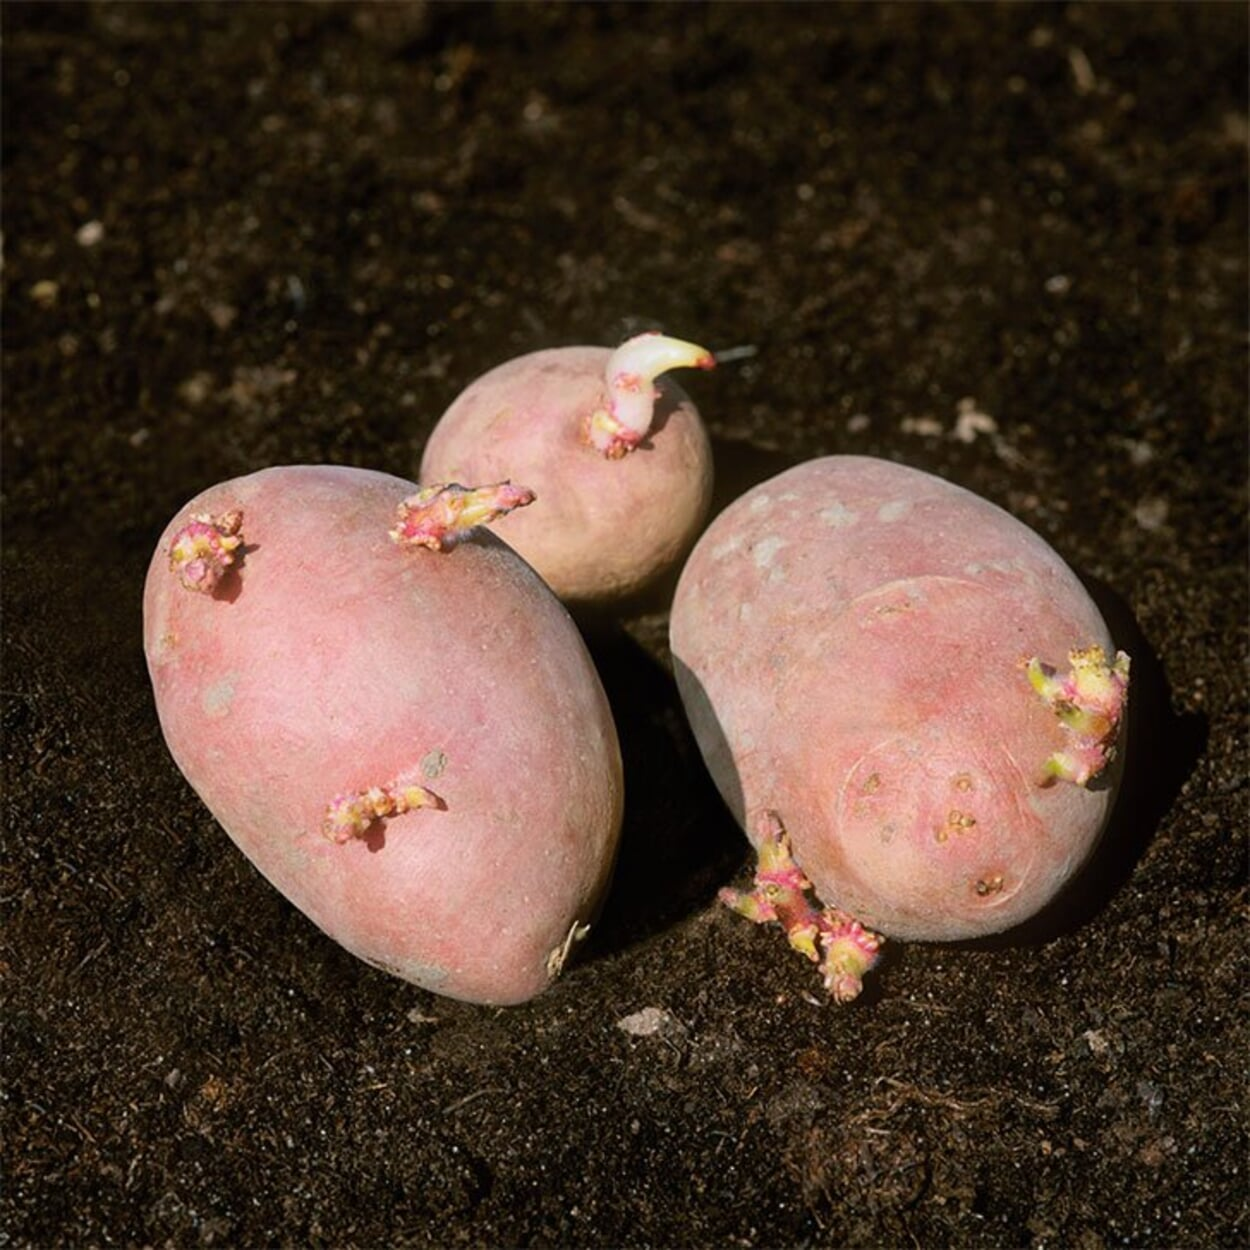 Angetriebene Kartoffeln mit kurzen, festen Keimen